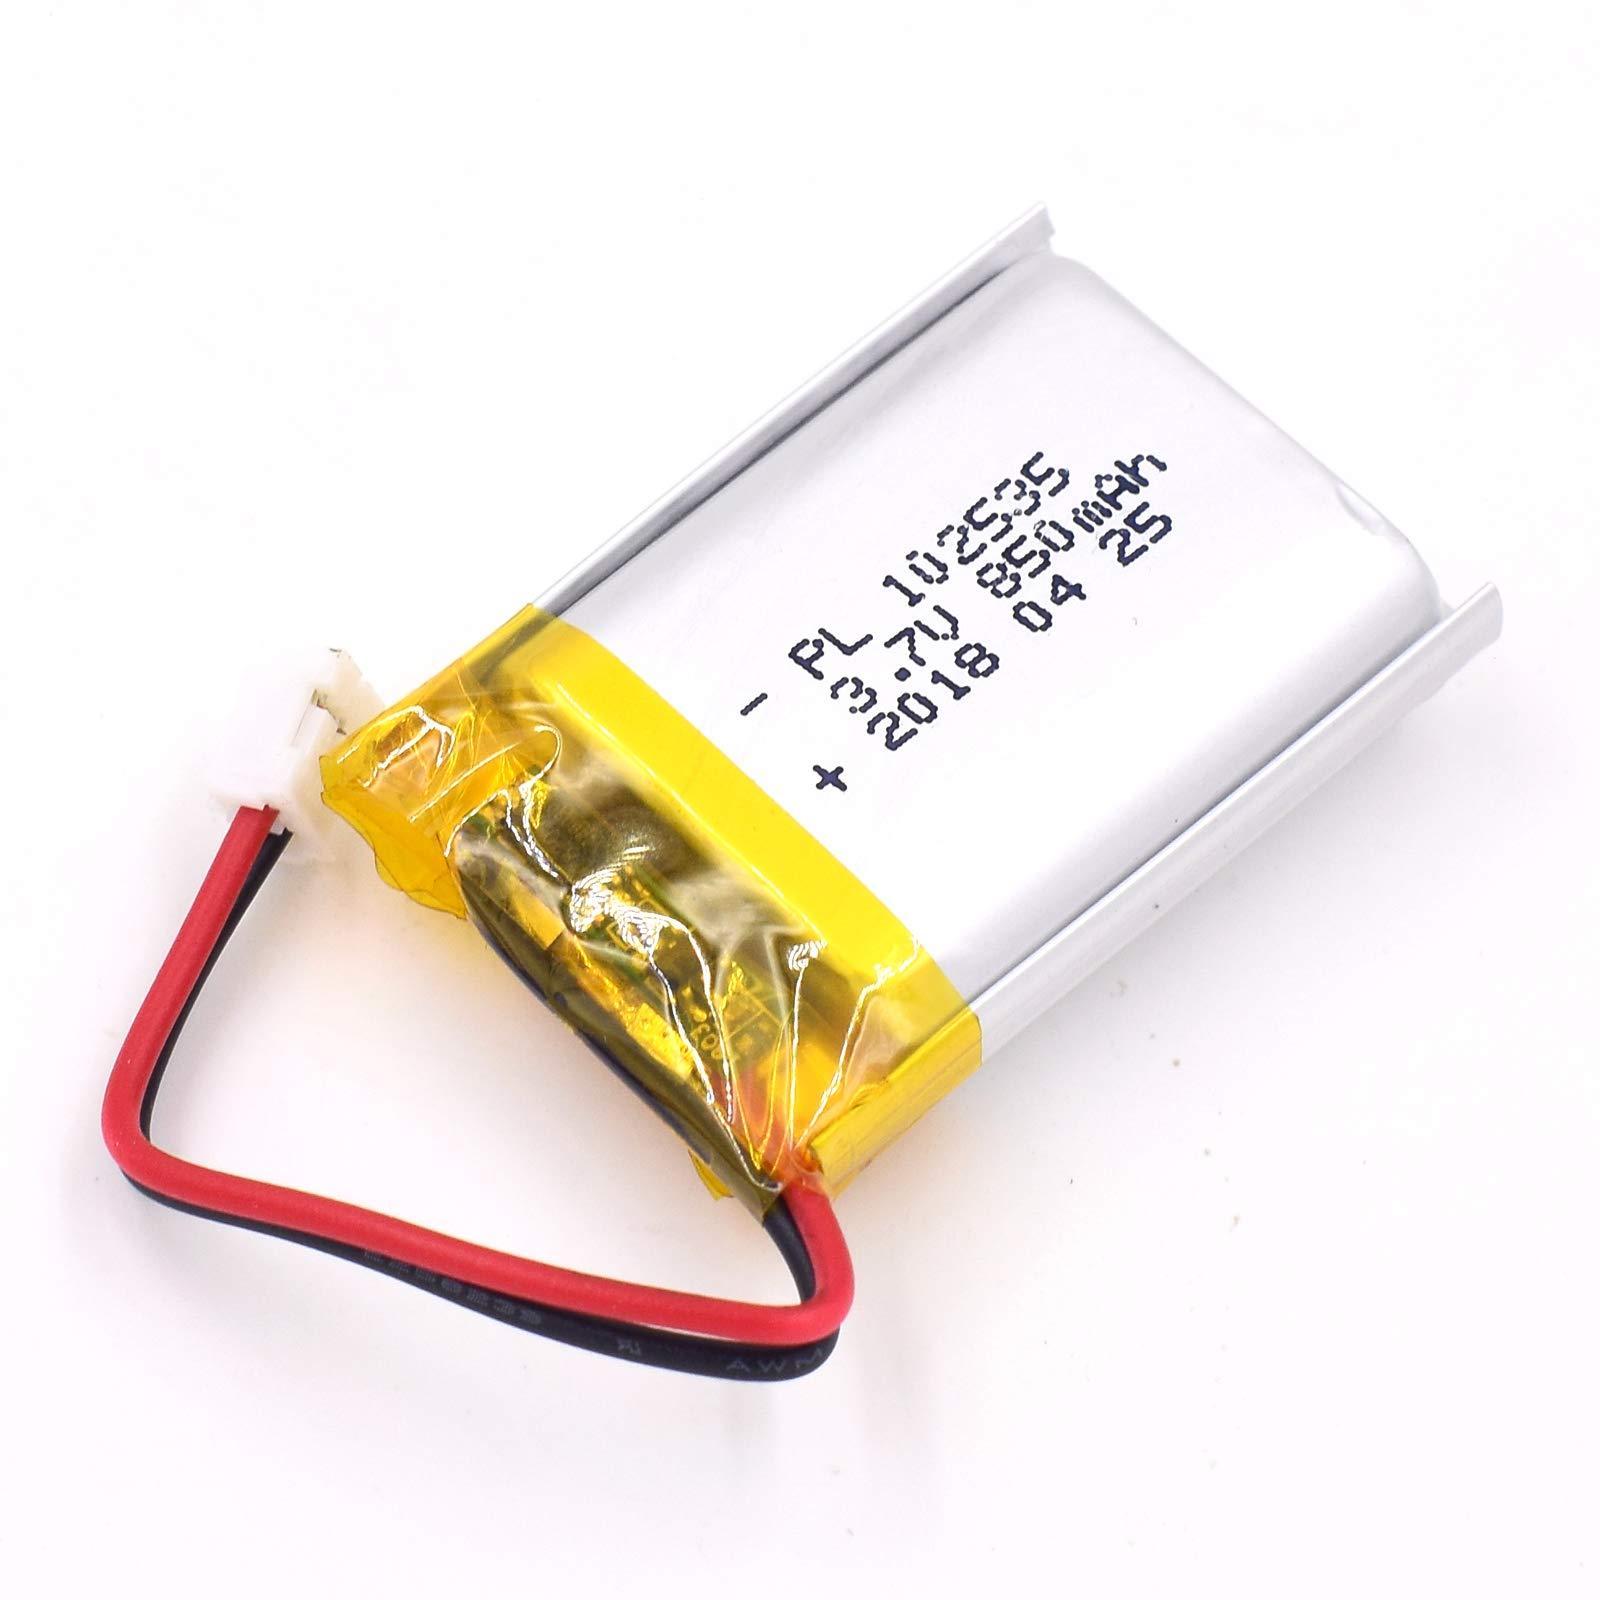 Bateria Lipo 3.7V 850mAh 102535 Recargable JST Conector